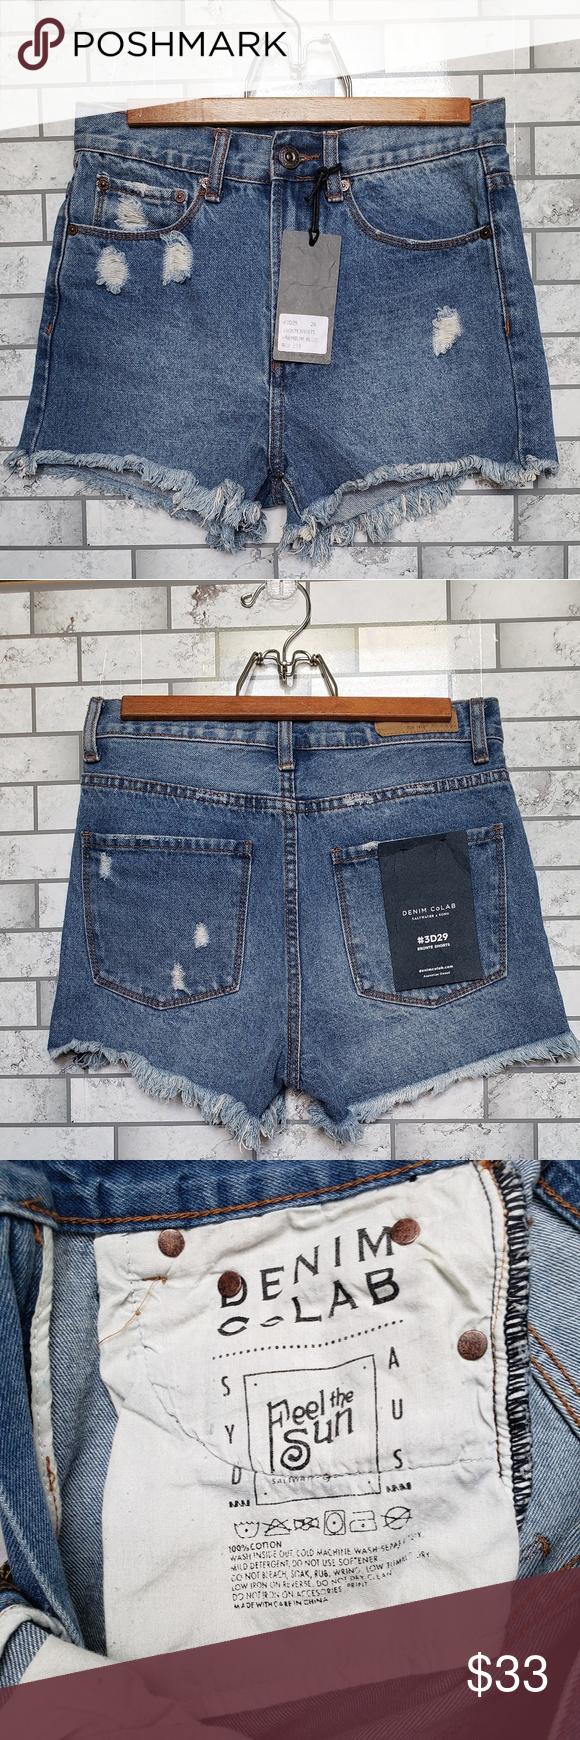 c9ddd51c90 Denim CoLAB NEW Highwaisted Shorts Denim CoLAB Saltwater & Song highwaisted jean  shorts features: *